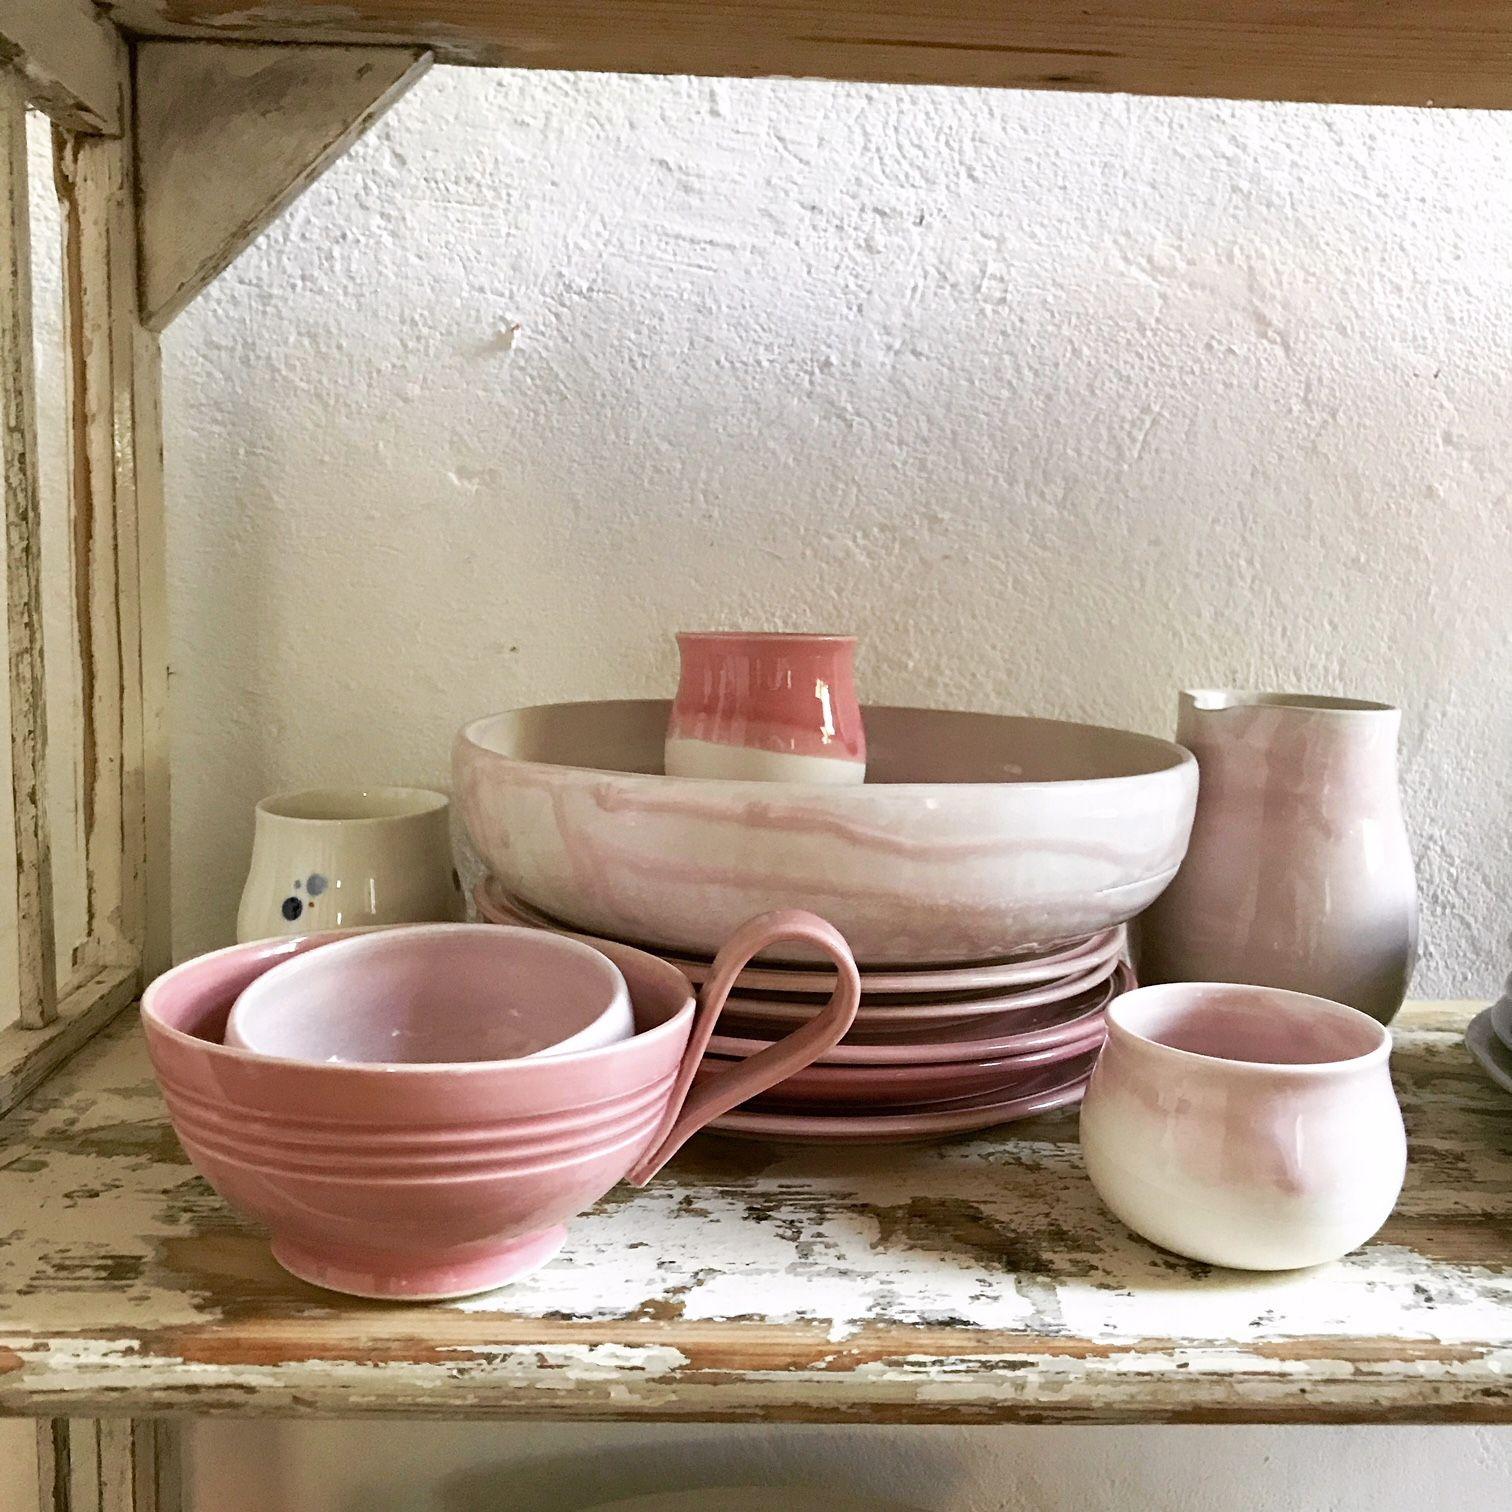 Rosa Geschirr Keramik Geschirr Geschirr Rosa Gerichte